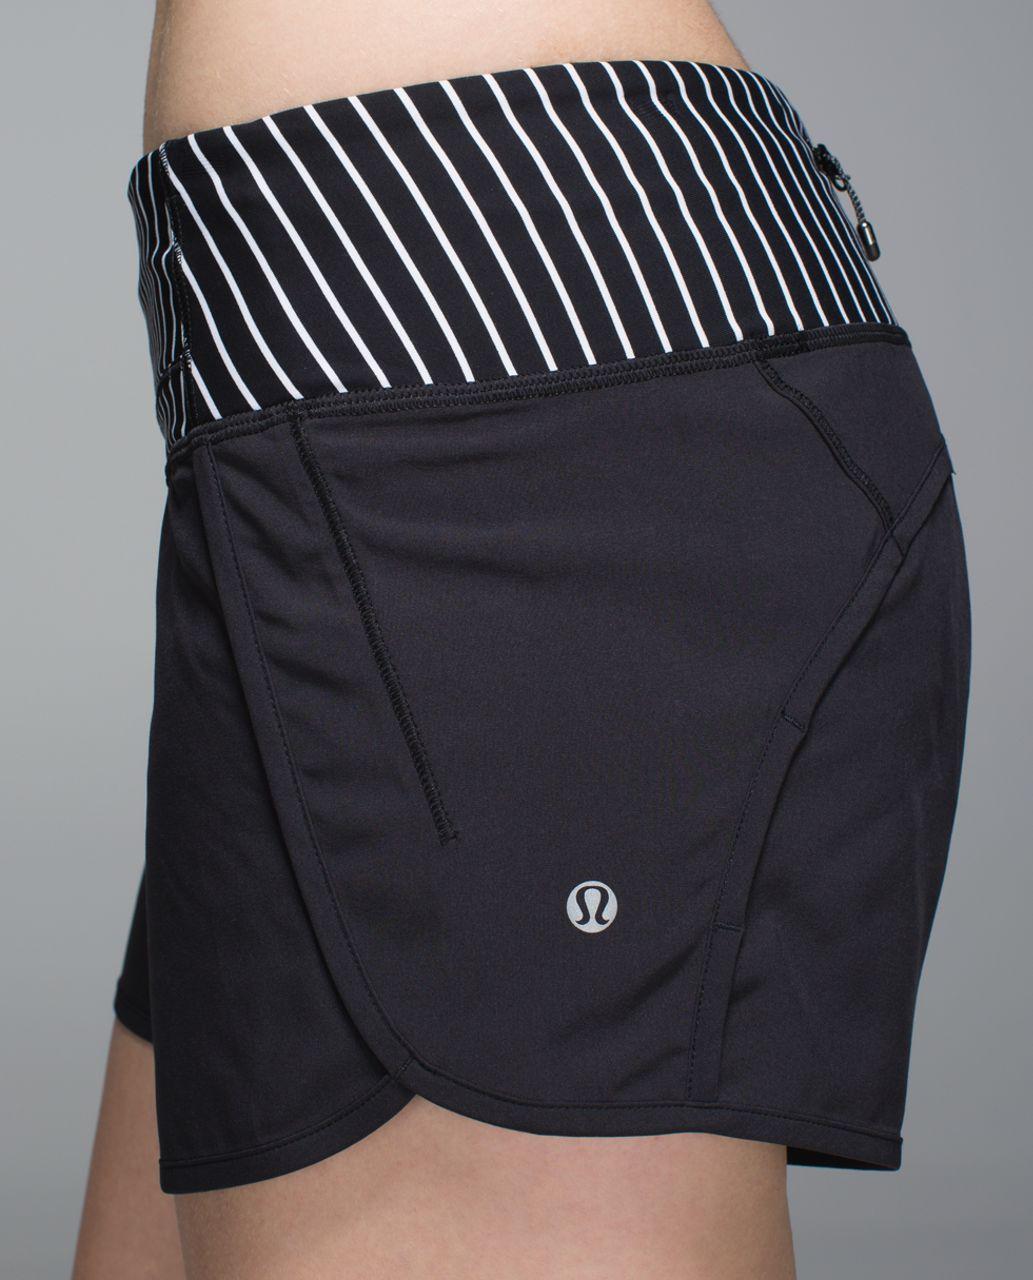 Lululemon Run Times Short *4-way Stretch - Black / Parallel Stripe White Black